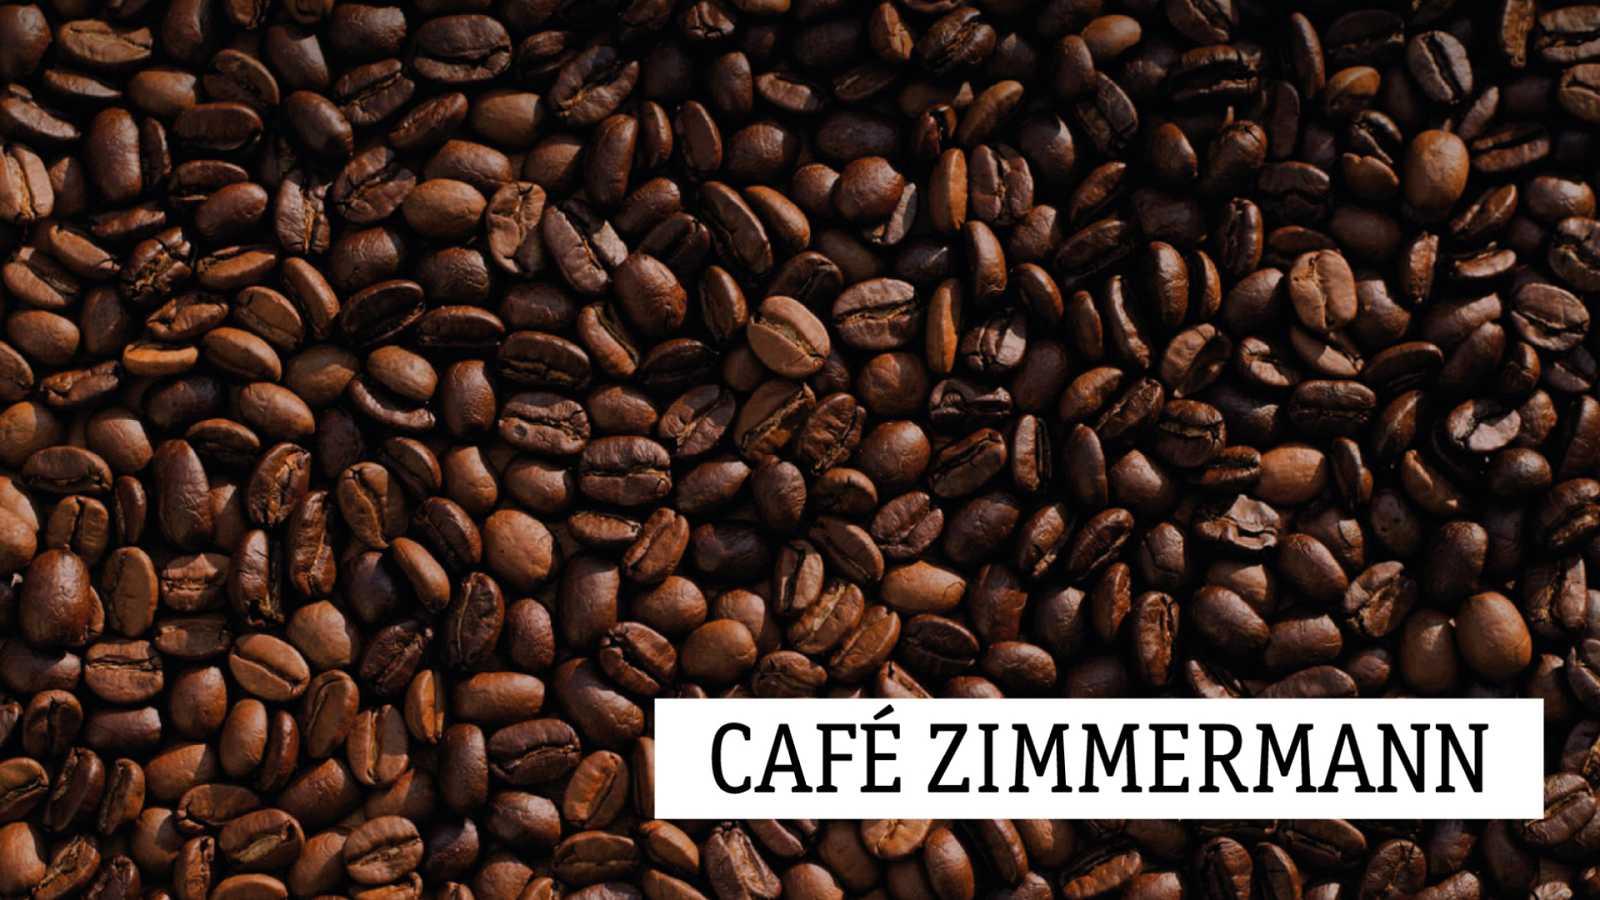 Café Zimmermann - ¡Hasta pronto! - 30/06/20 - escuchar ahora